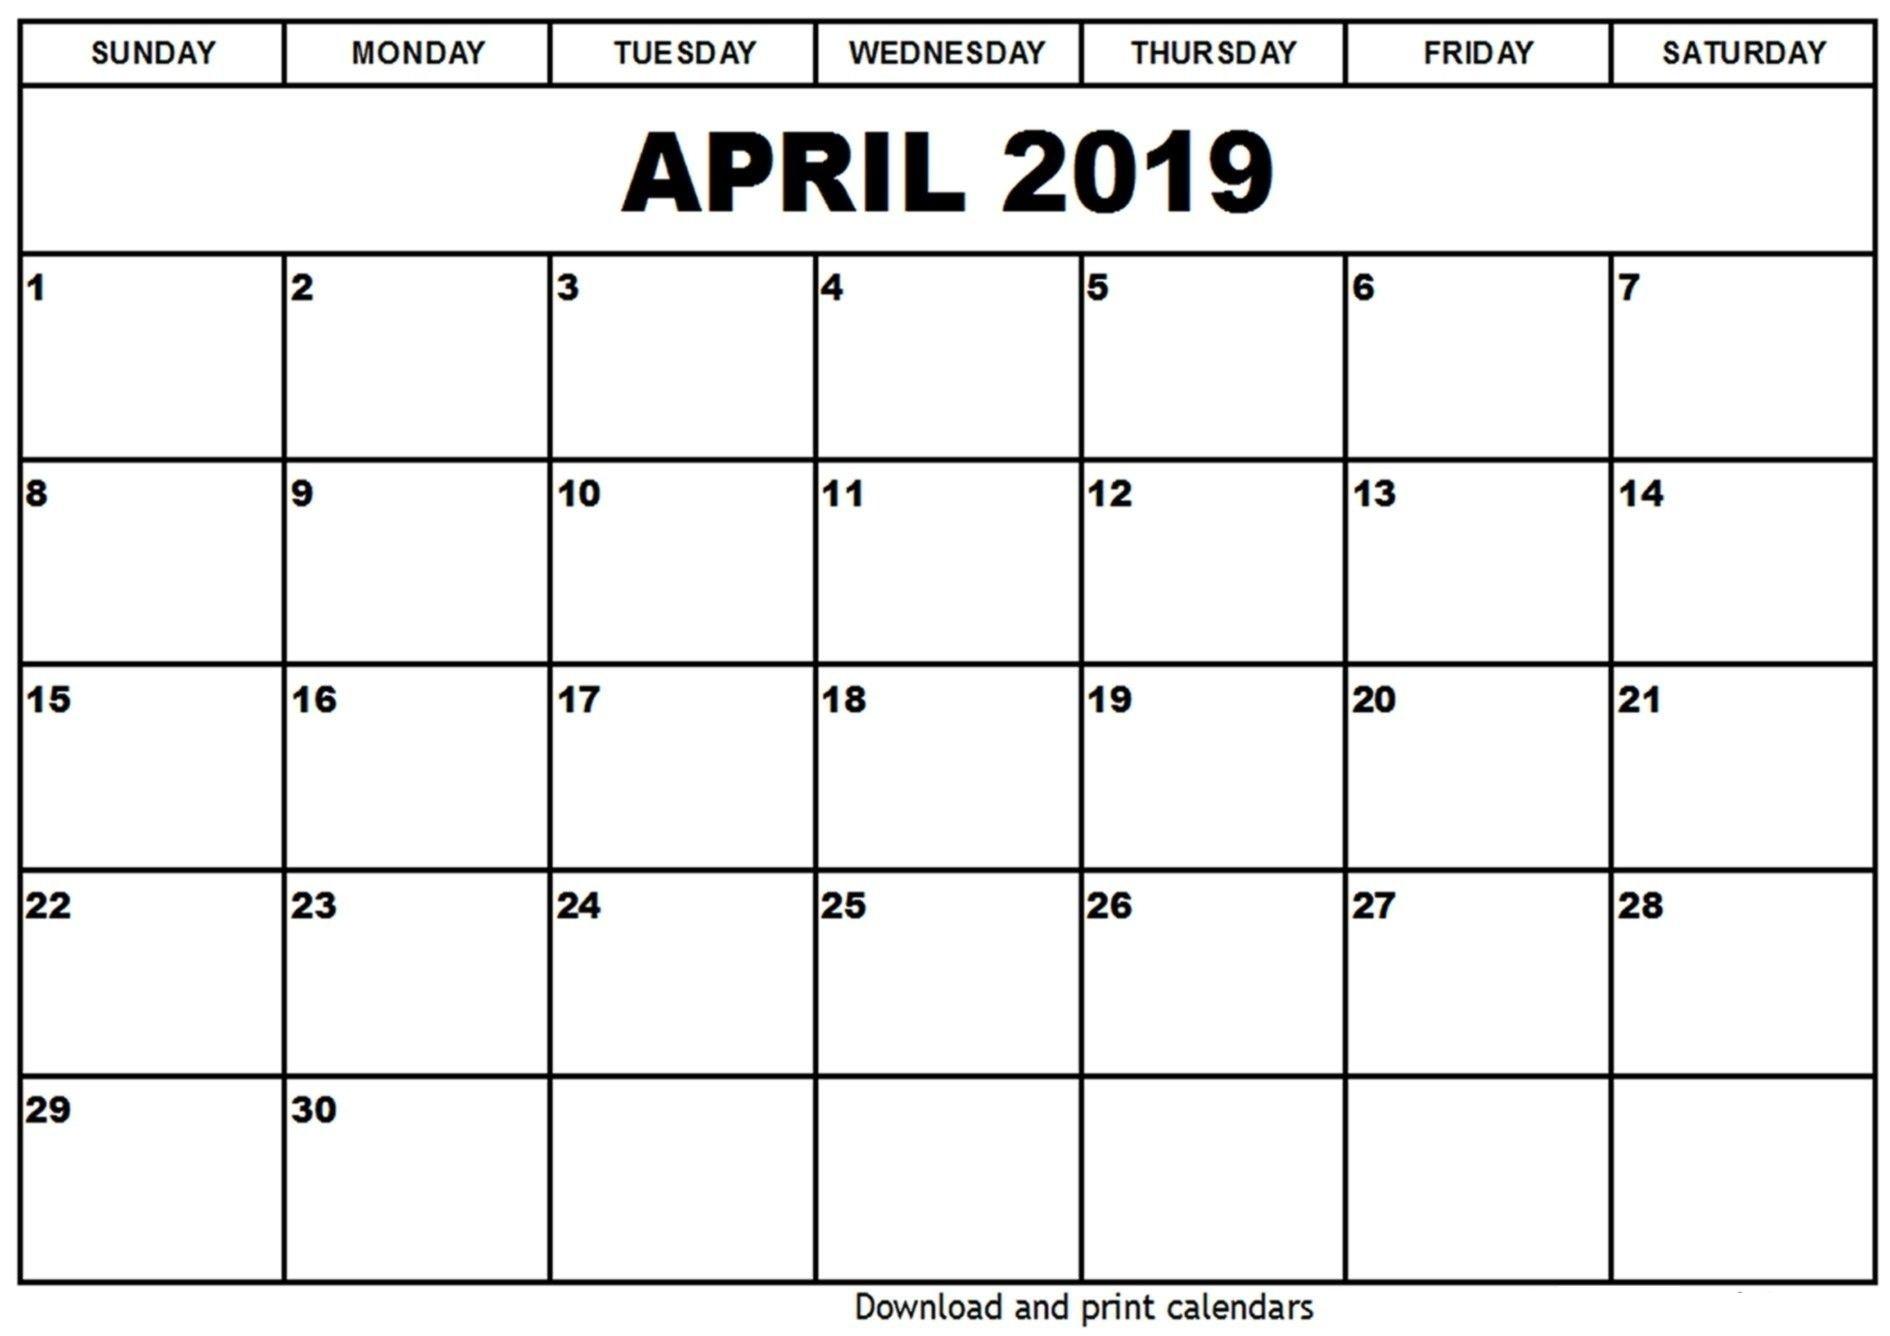 April 5 2019 Calendar | Calendar Format Example April 5 2019 Calendar